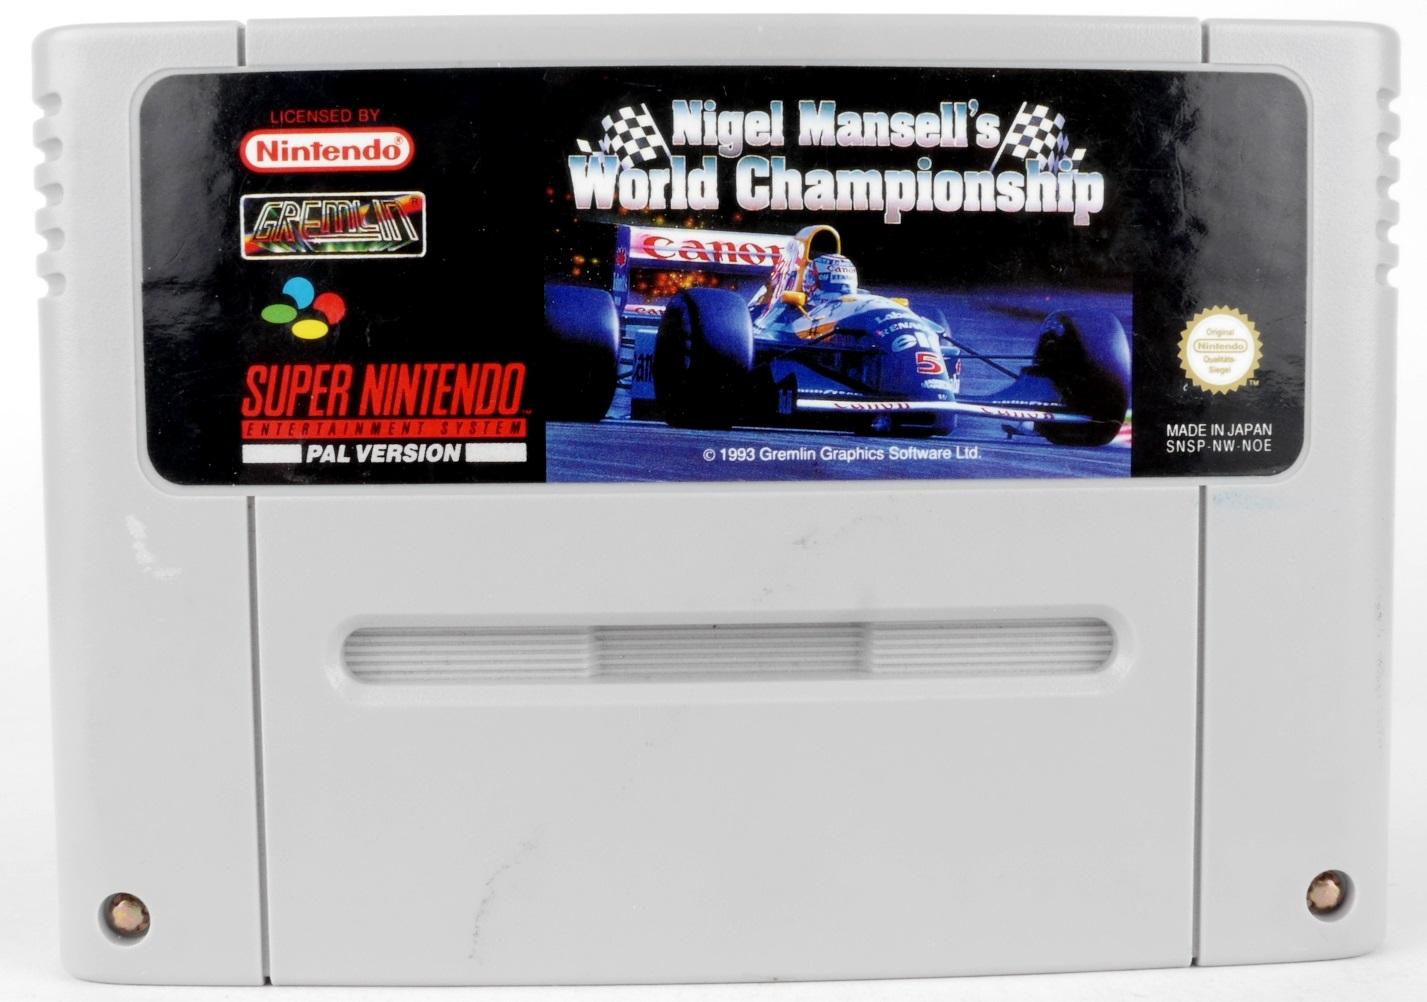 Nigel Mansell's World Championship Racing SNES